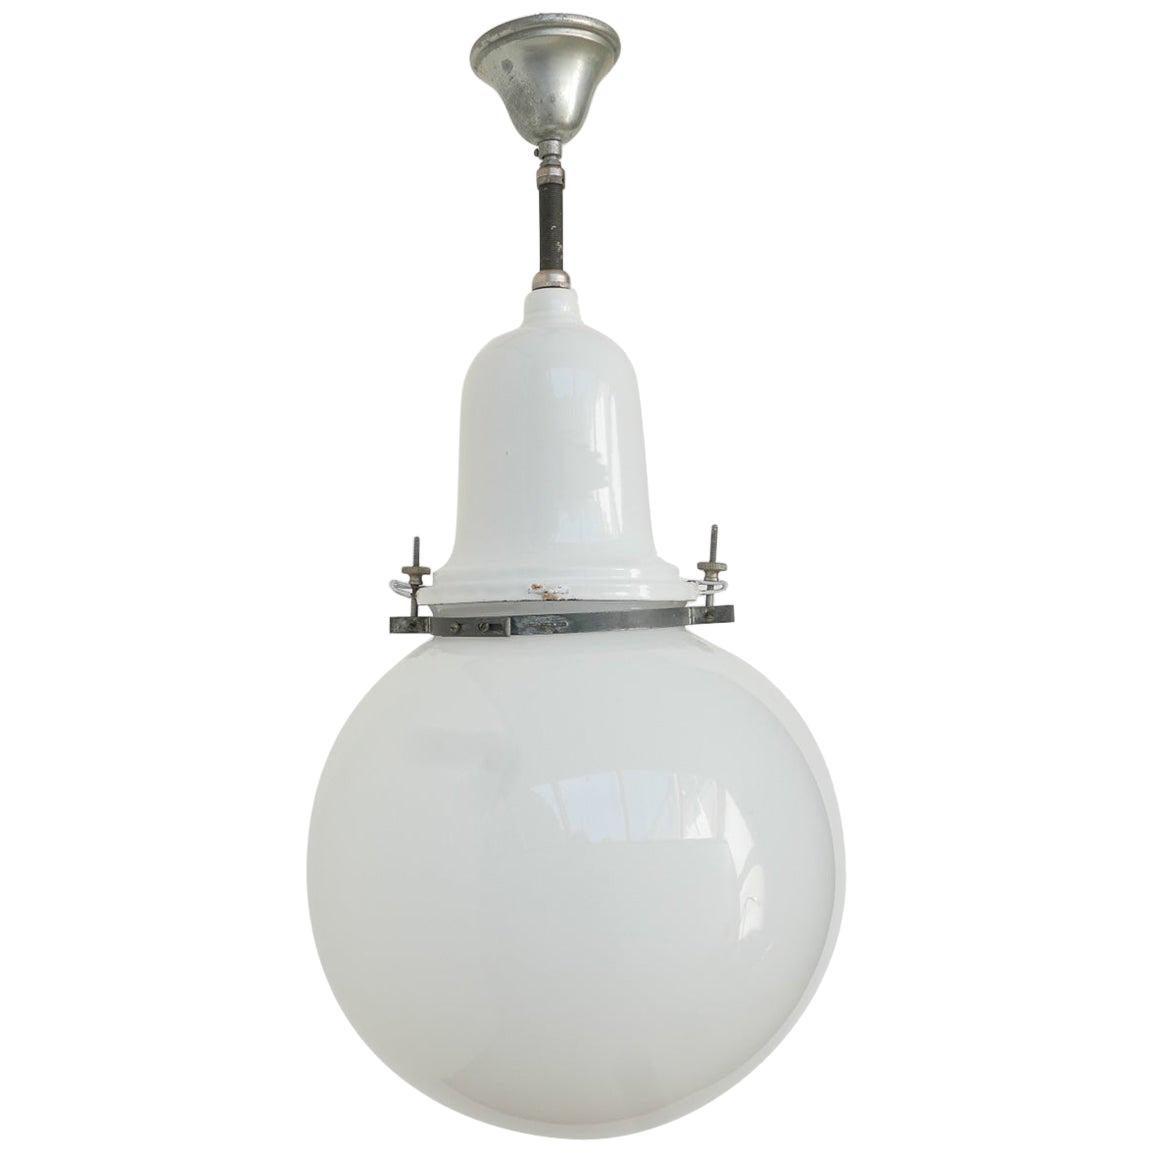 Early 20th Century Industrial Opaline Pendant Light